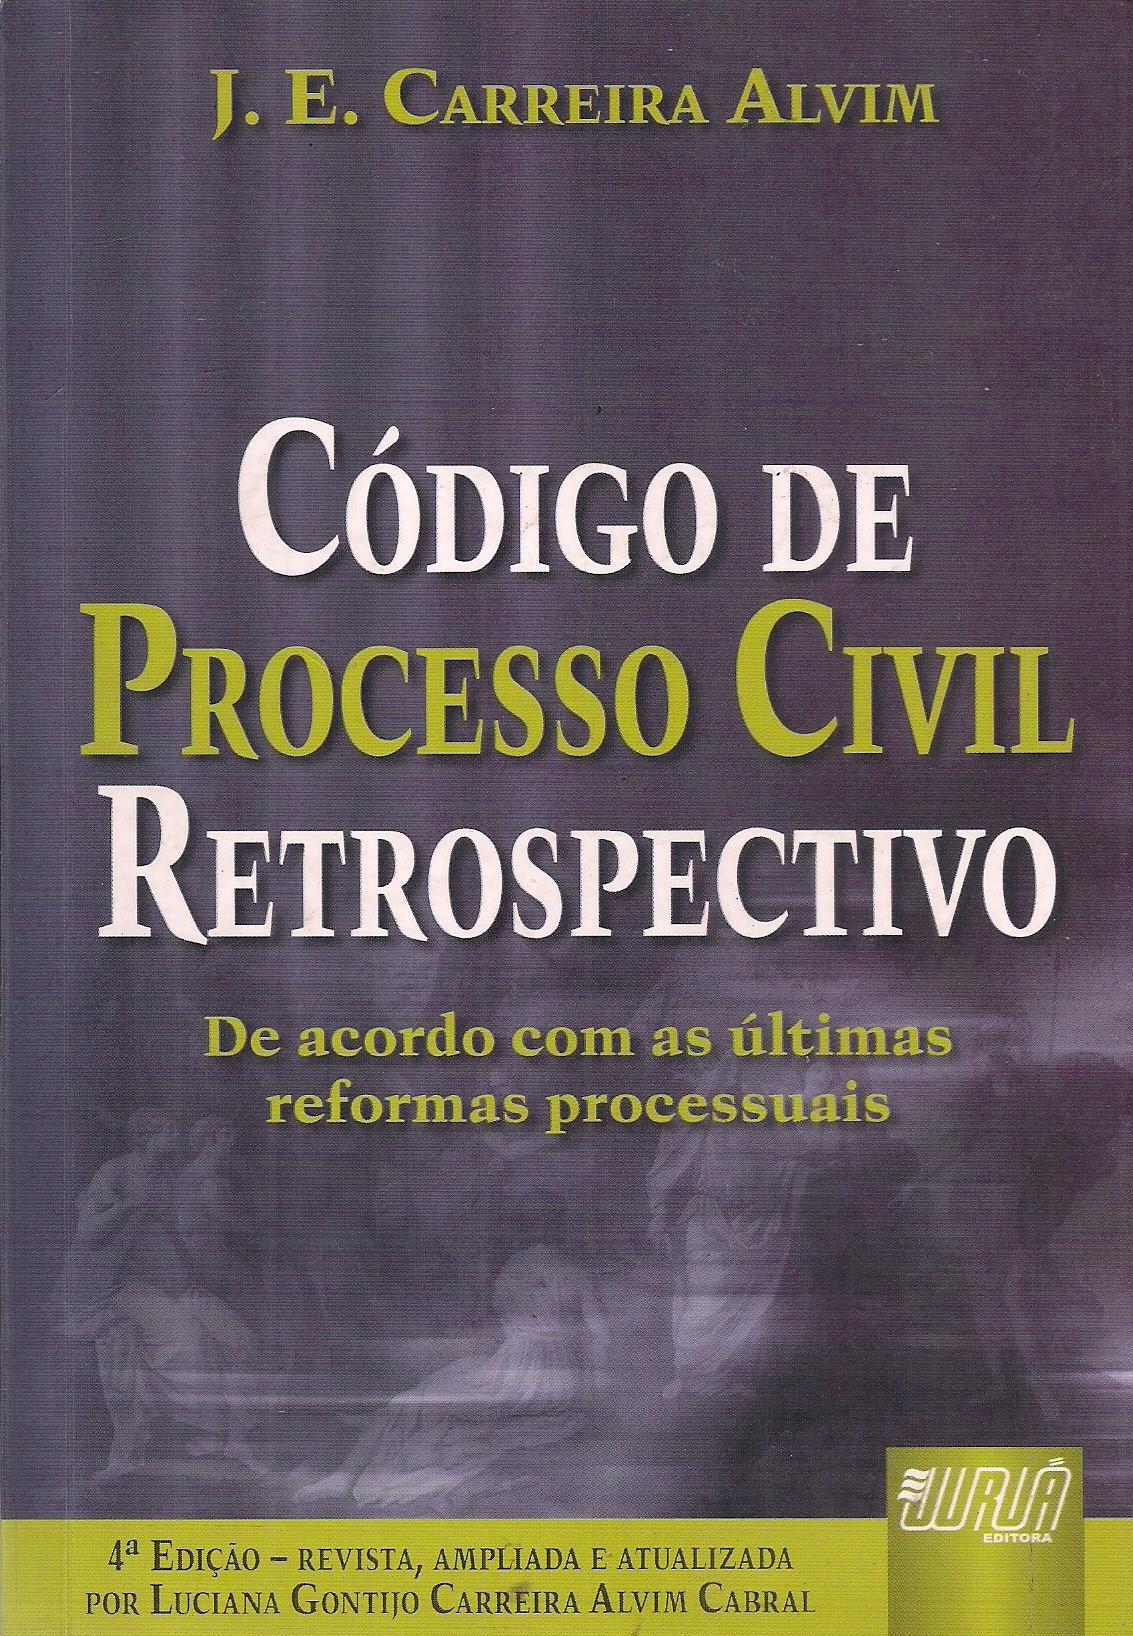 Foto 1 - Código de Processo Civil Retrospectivo